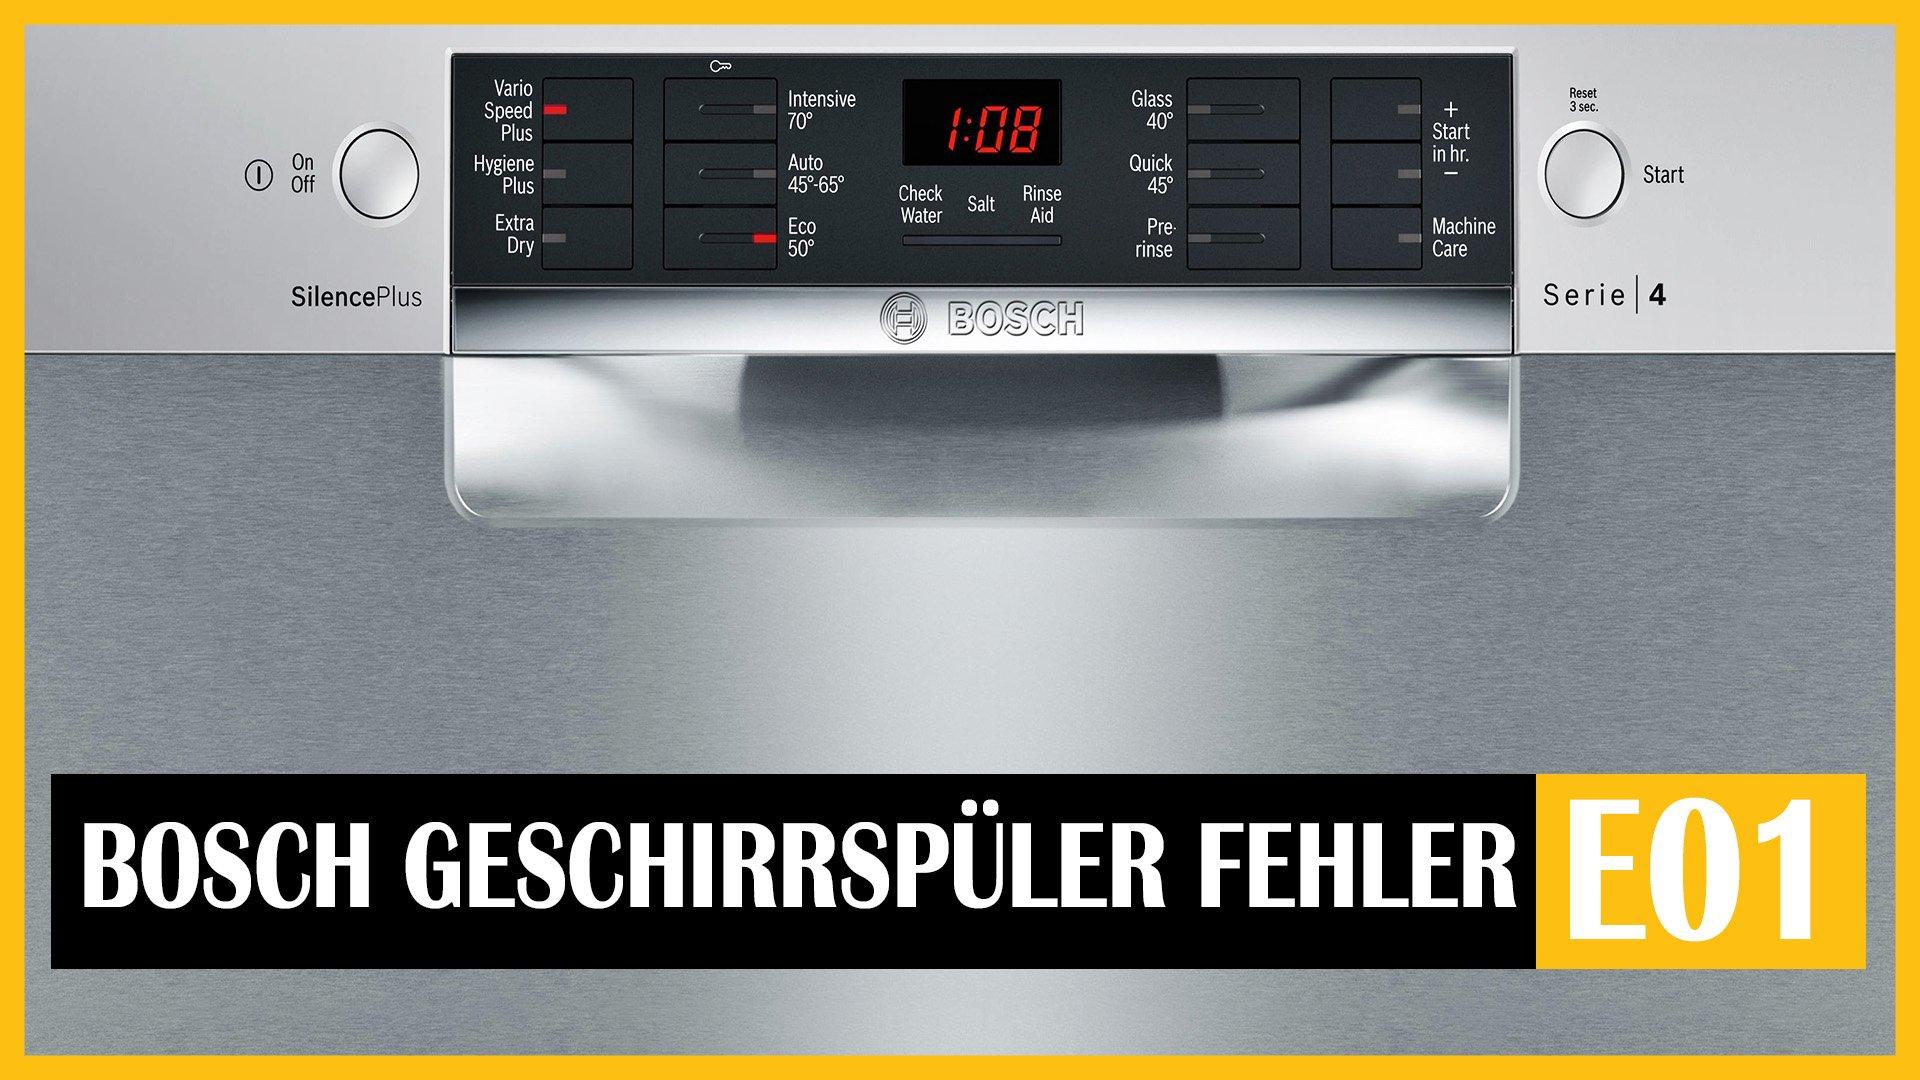 Berühmt Bosch Geschirrspüler Fehler e01 MJ17